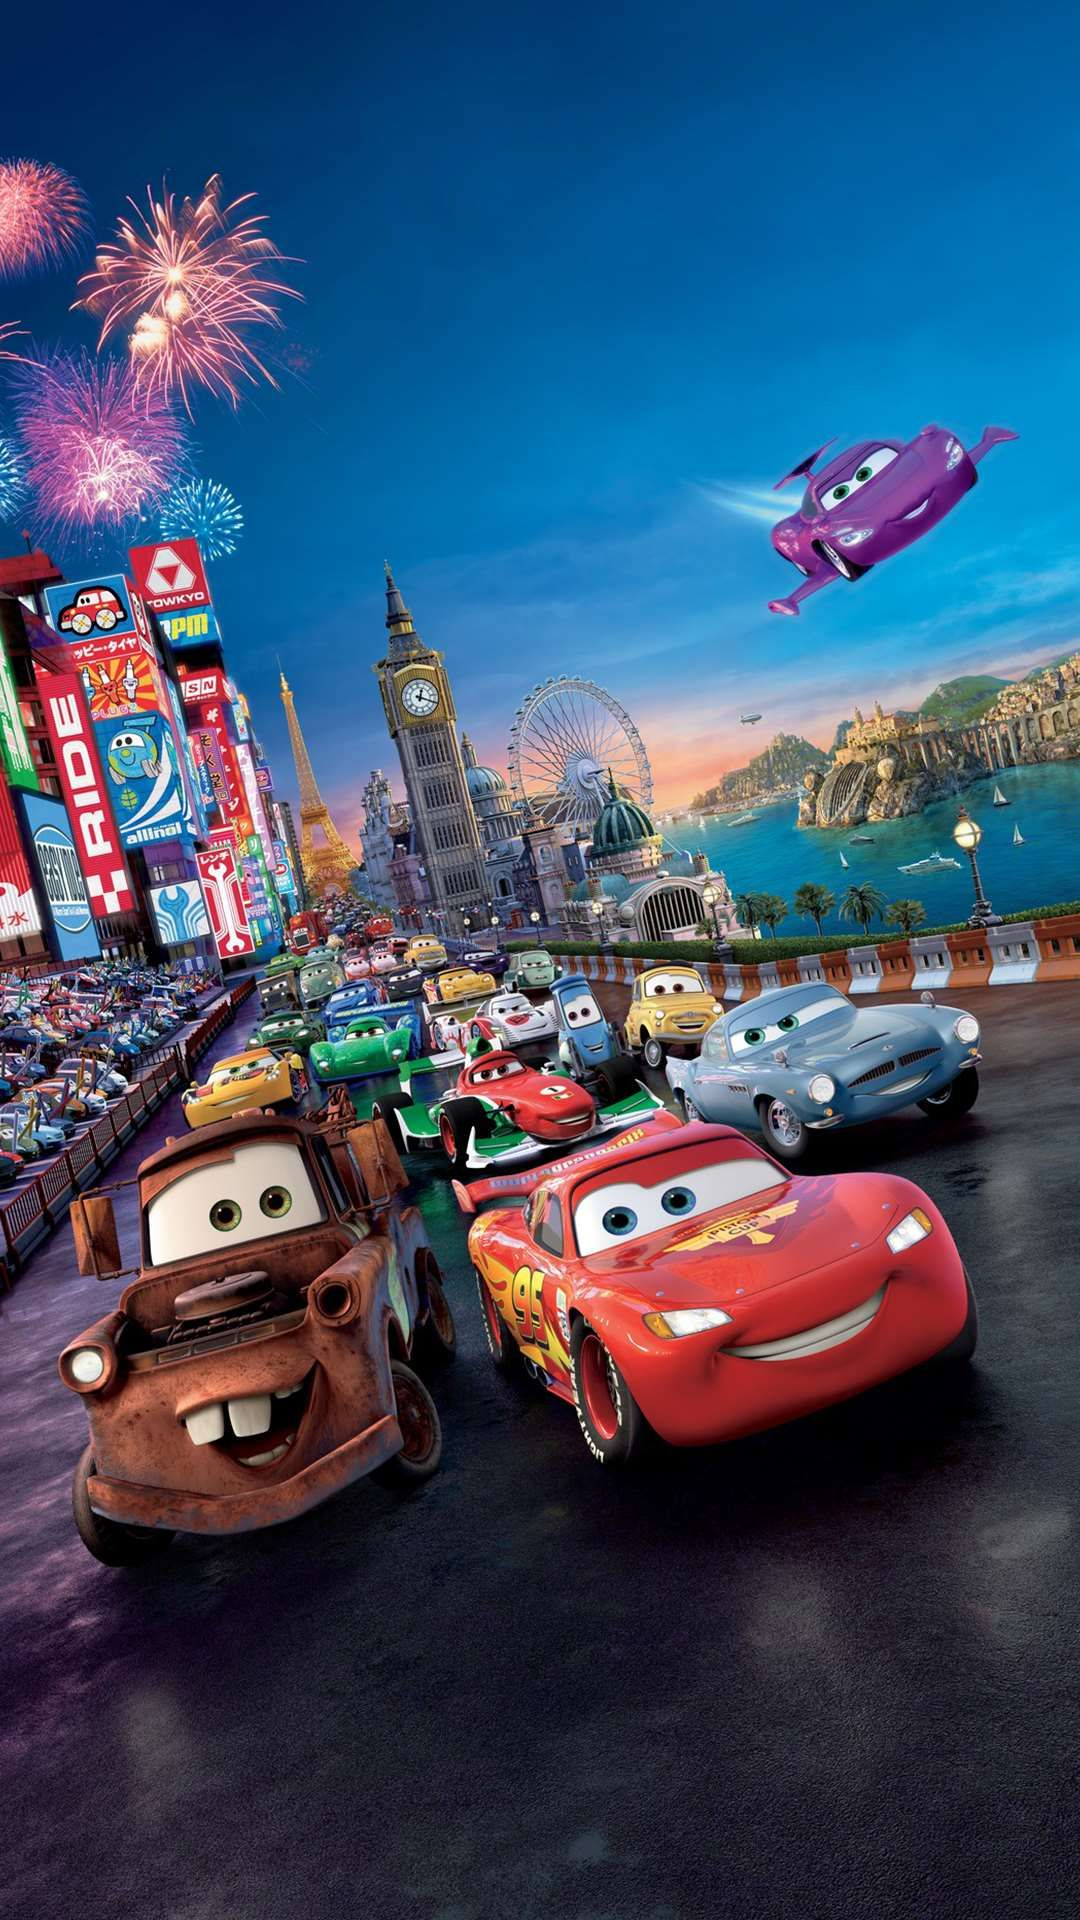 Mcqueen Car 3 Disney Cars Wallpaper Disney Cars Disney Wallpaper